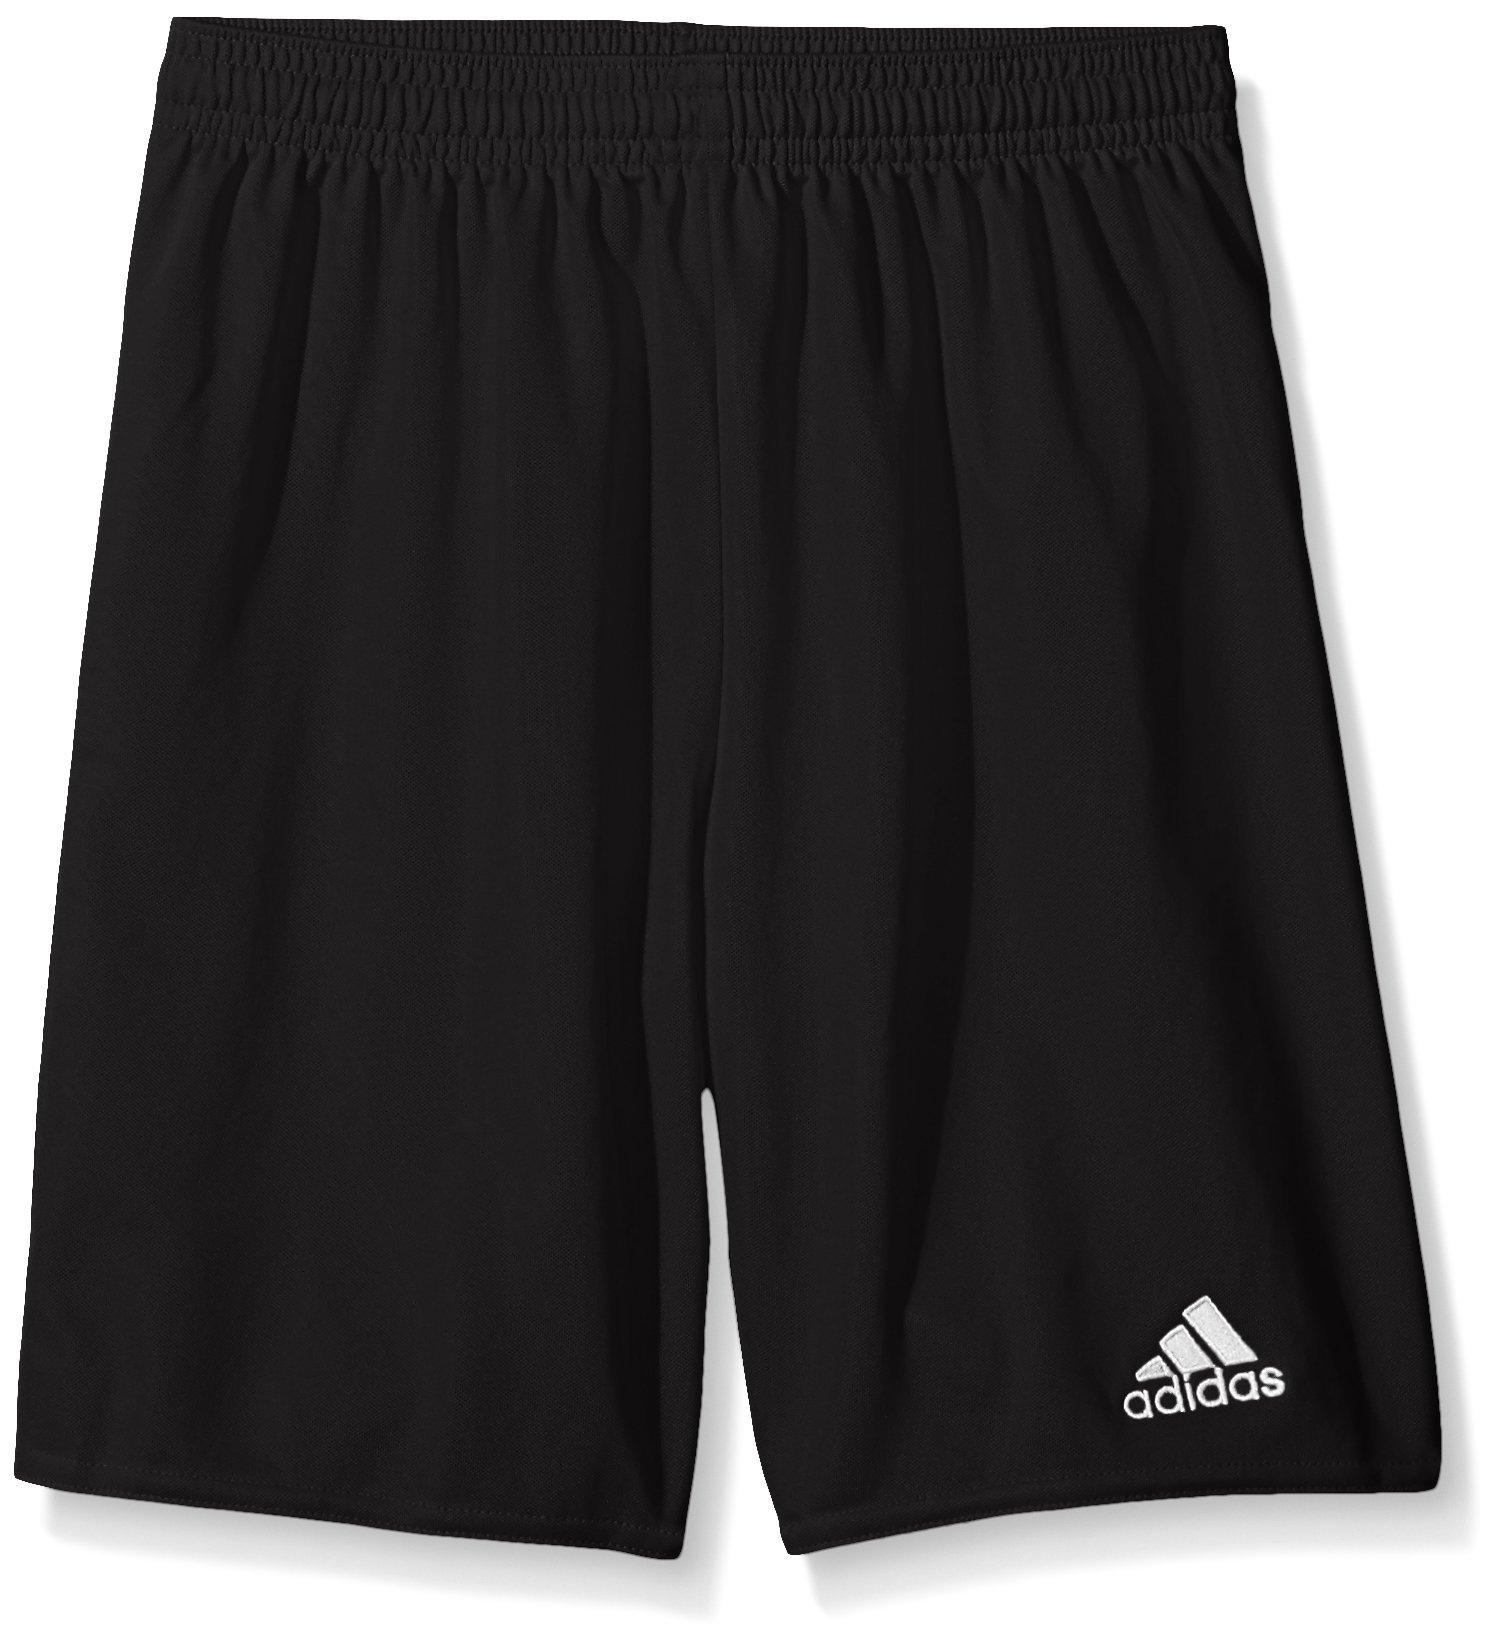 adidas Youth Parma 16 Shorts, Black/White, XX-Small